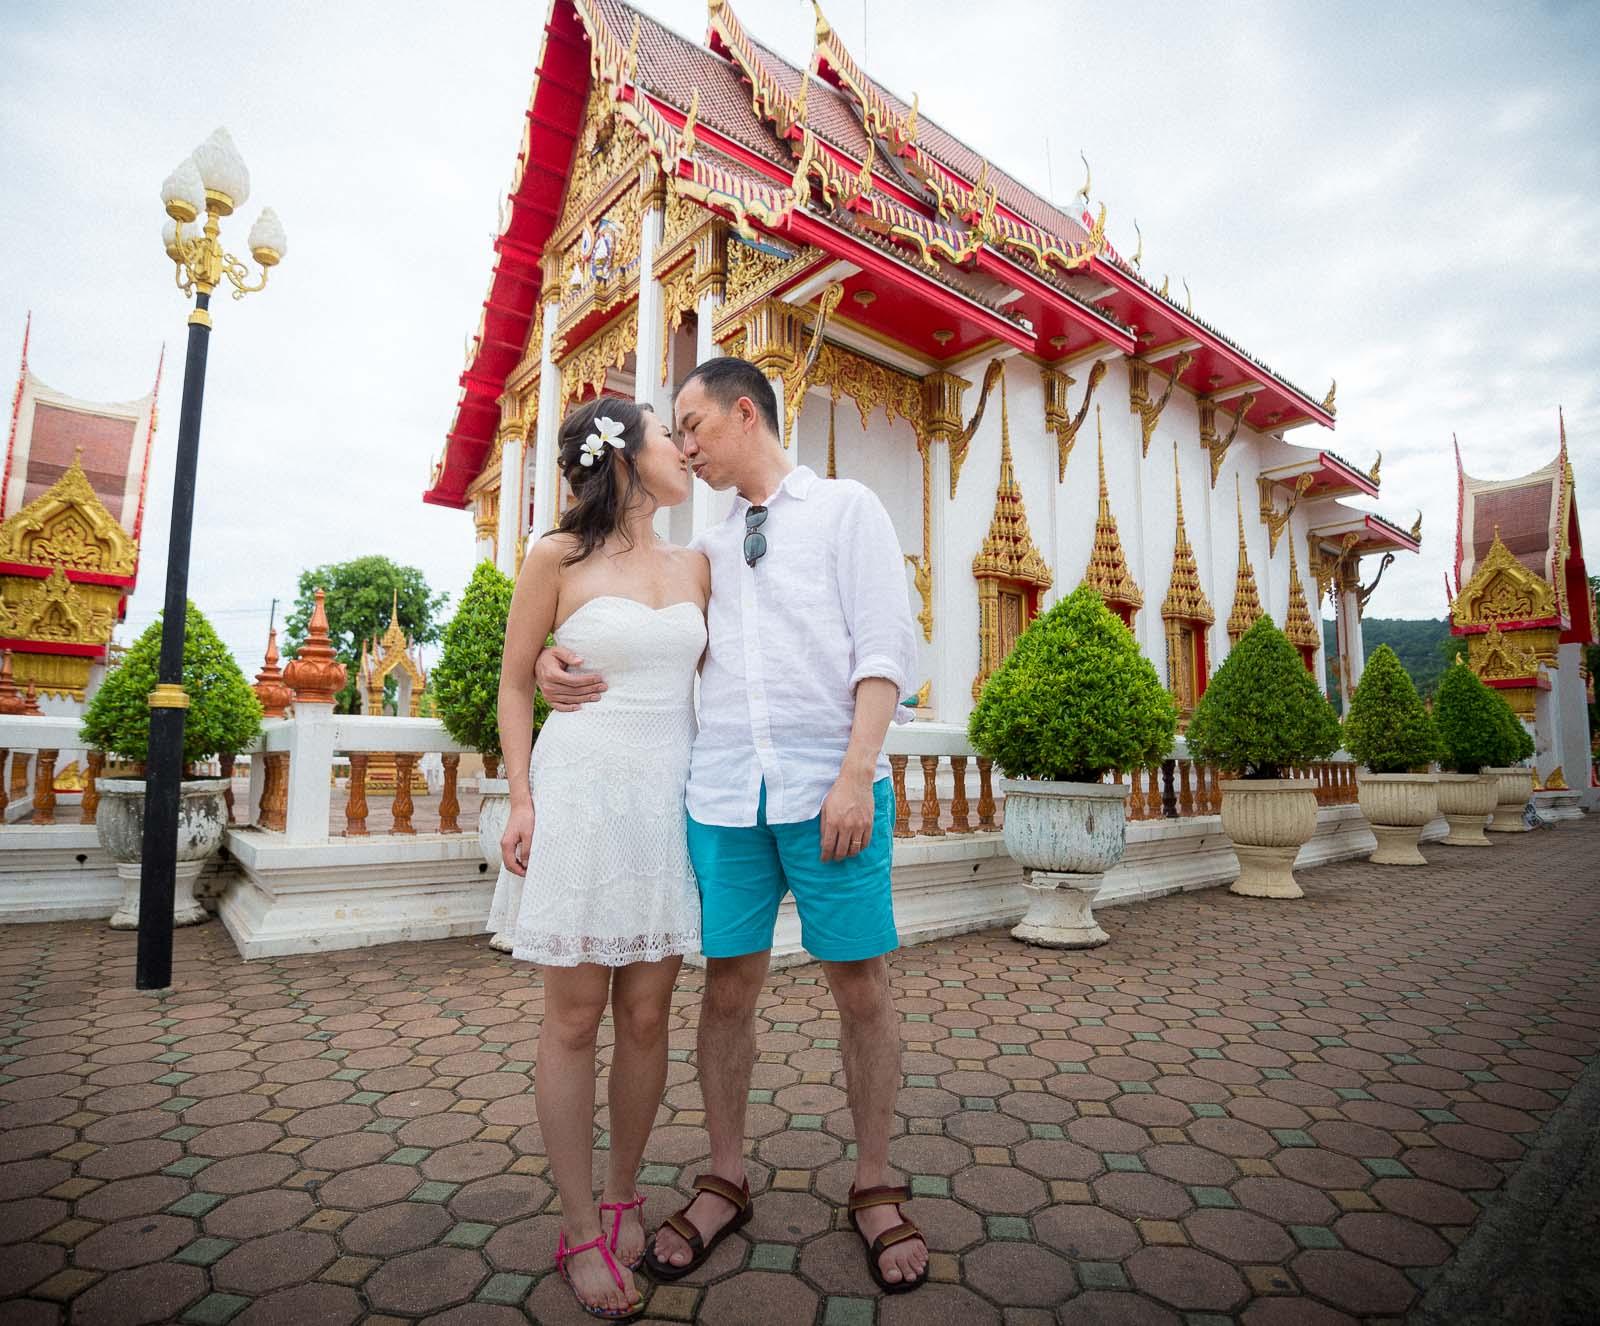 phuket-prewedding-photographer-thailand-wedding-photography-012